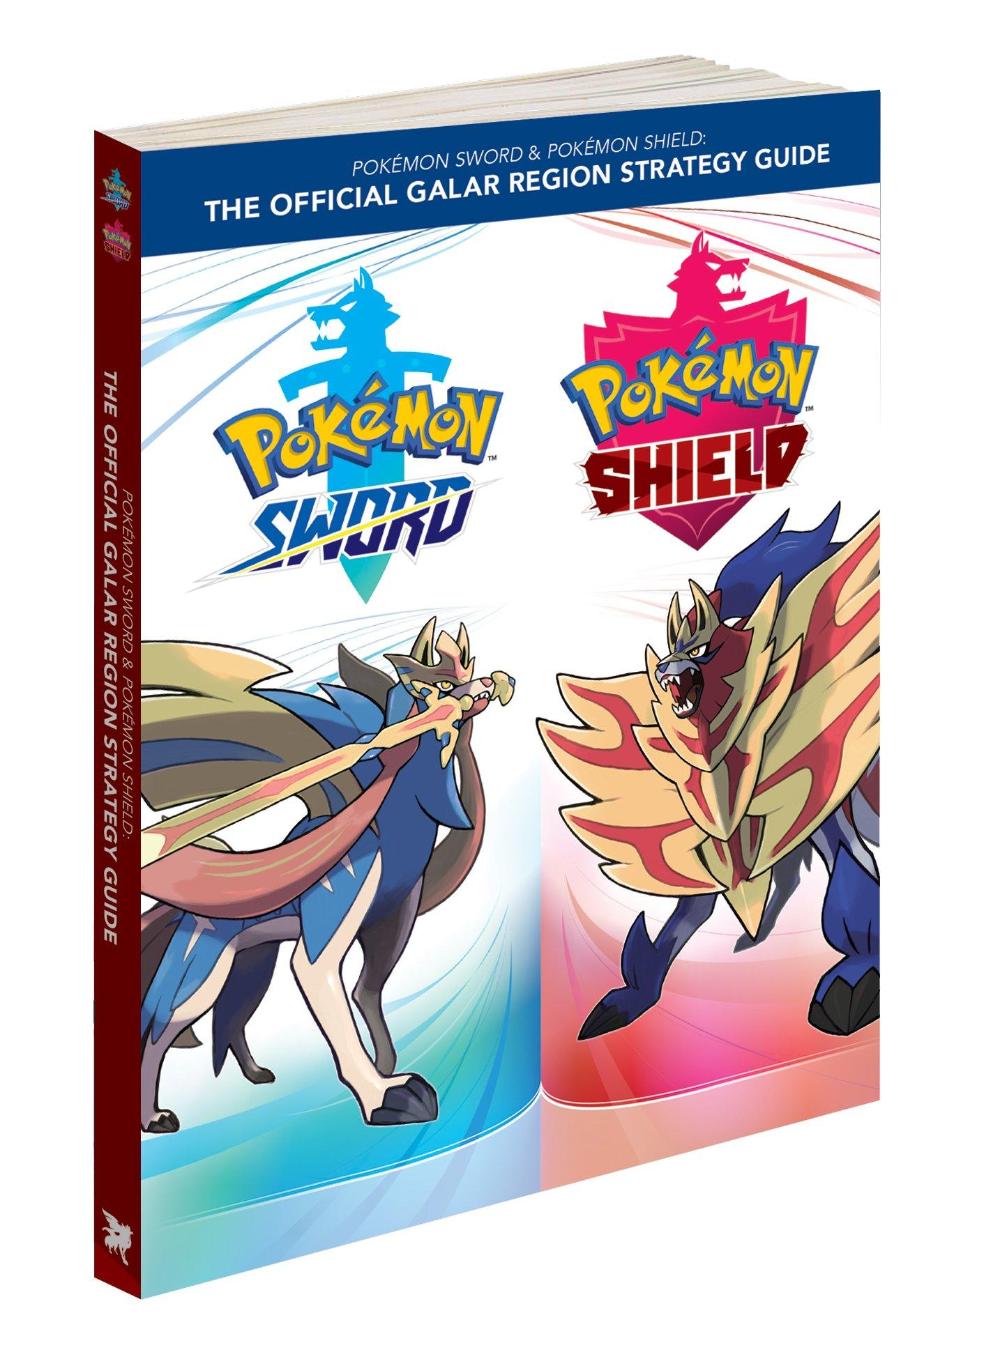 Pokemon Sword And Shield Trending Images Gallery Page 4 List View Pokemon New Pokemon Type Pokemon